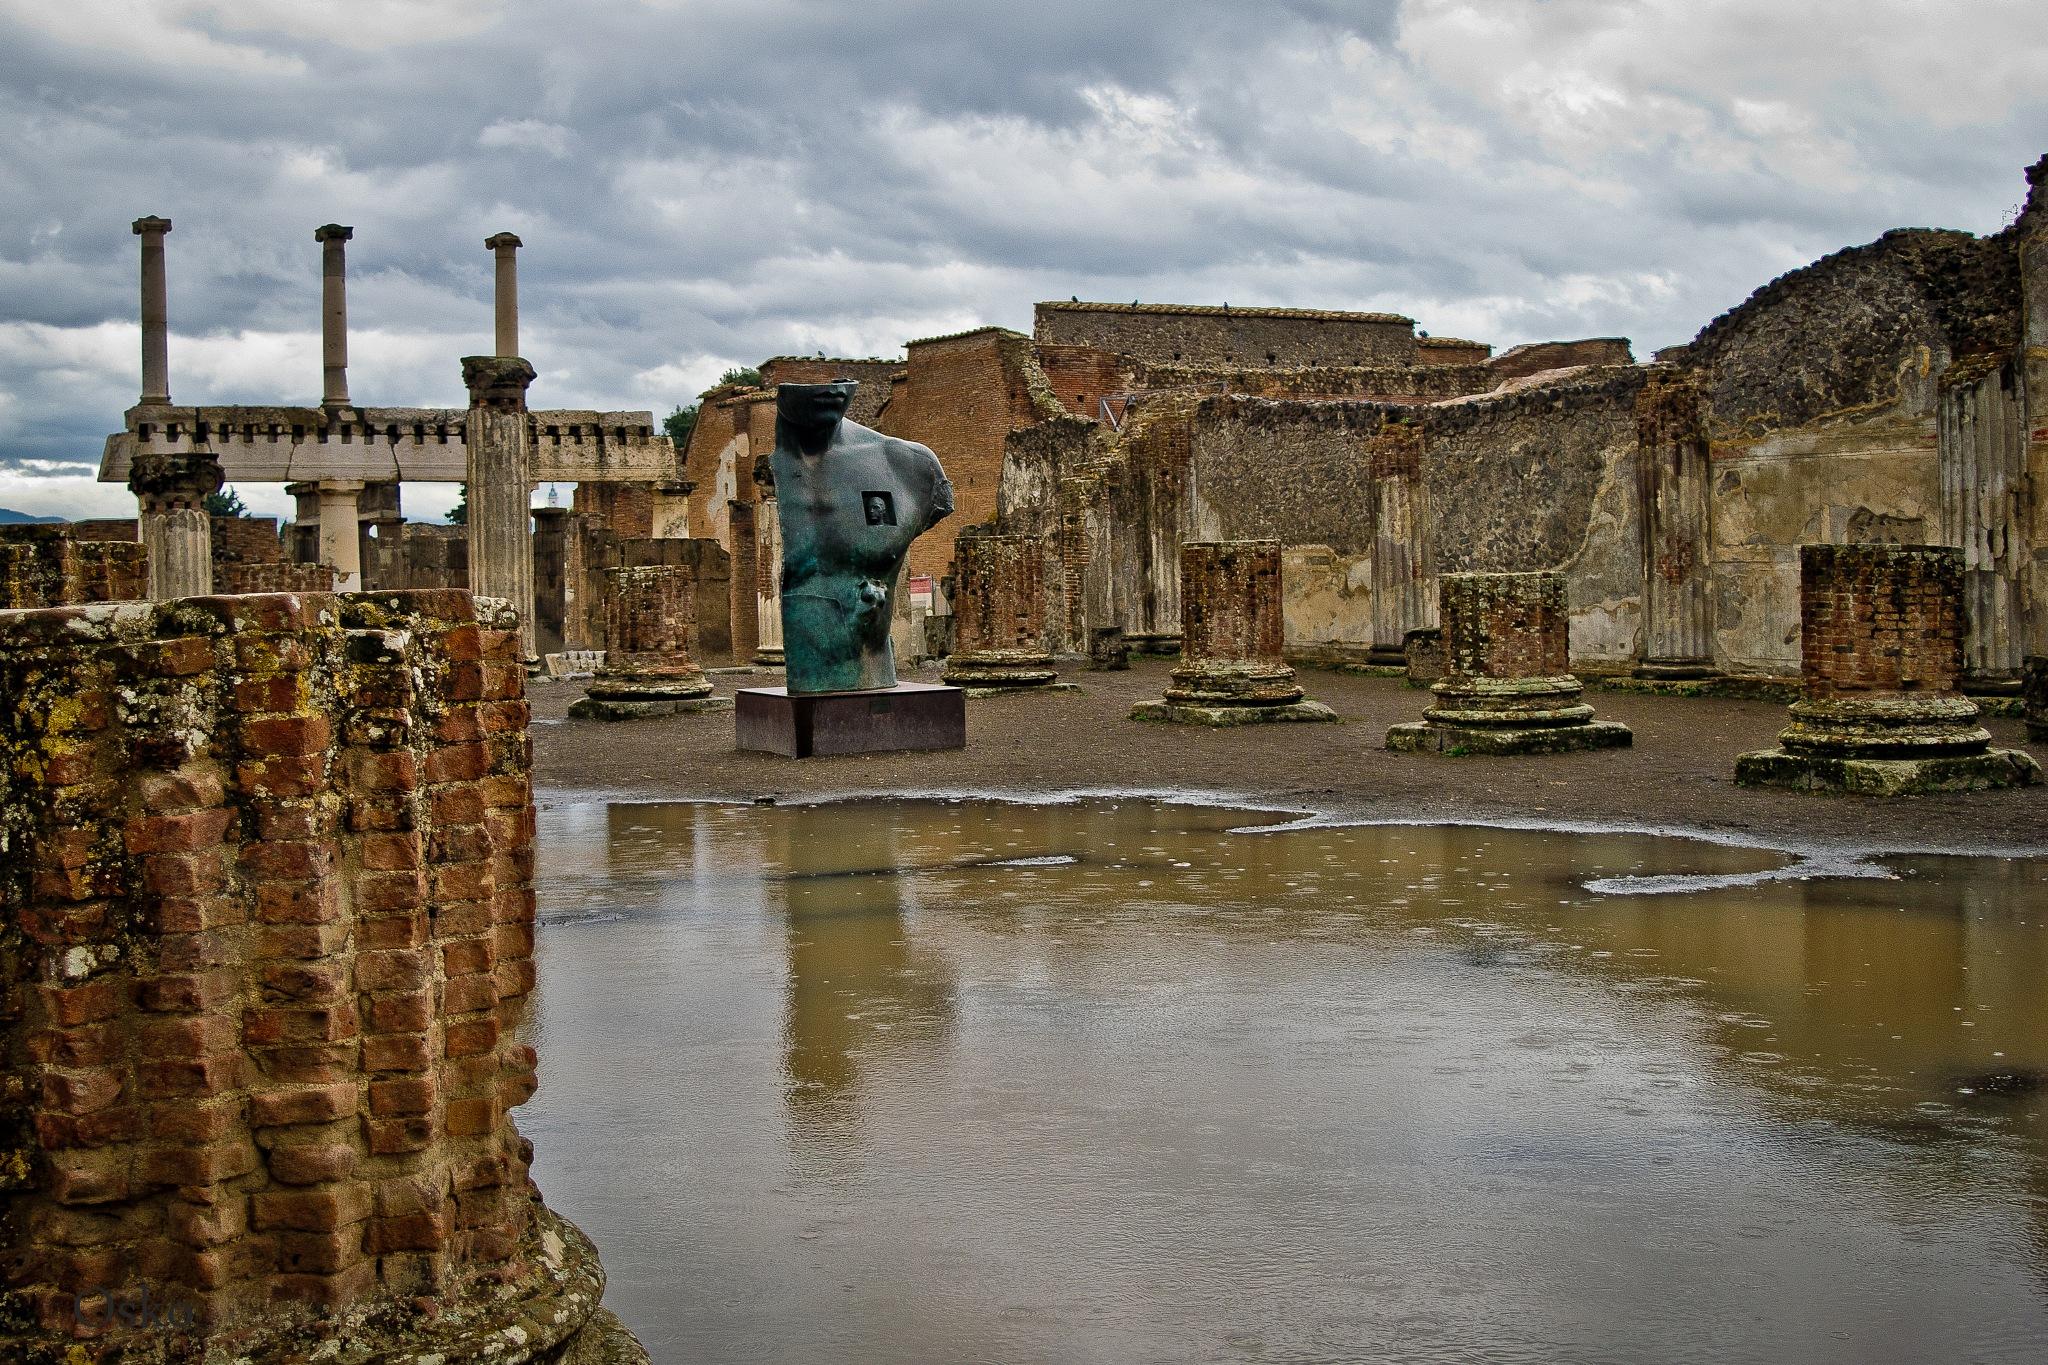 Las ruinas de Pompei by oscarruben_suarez